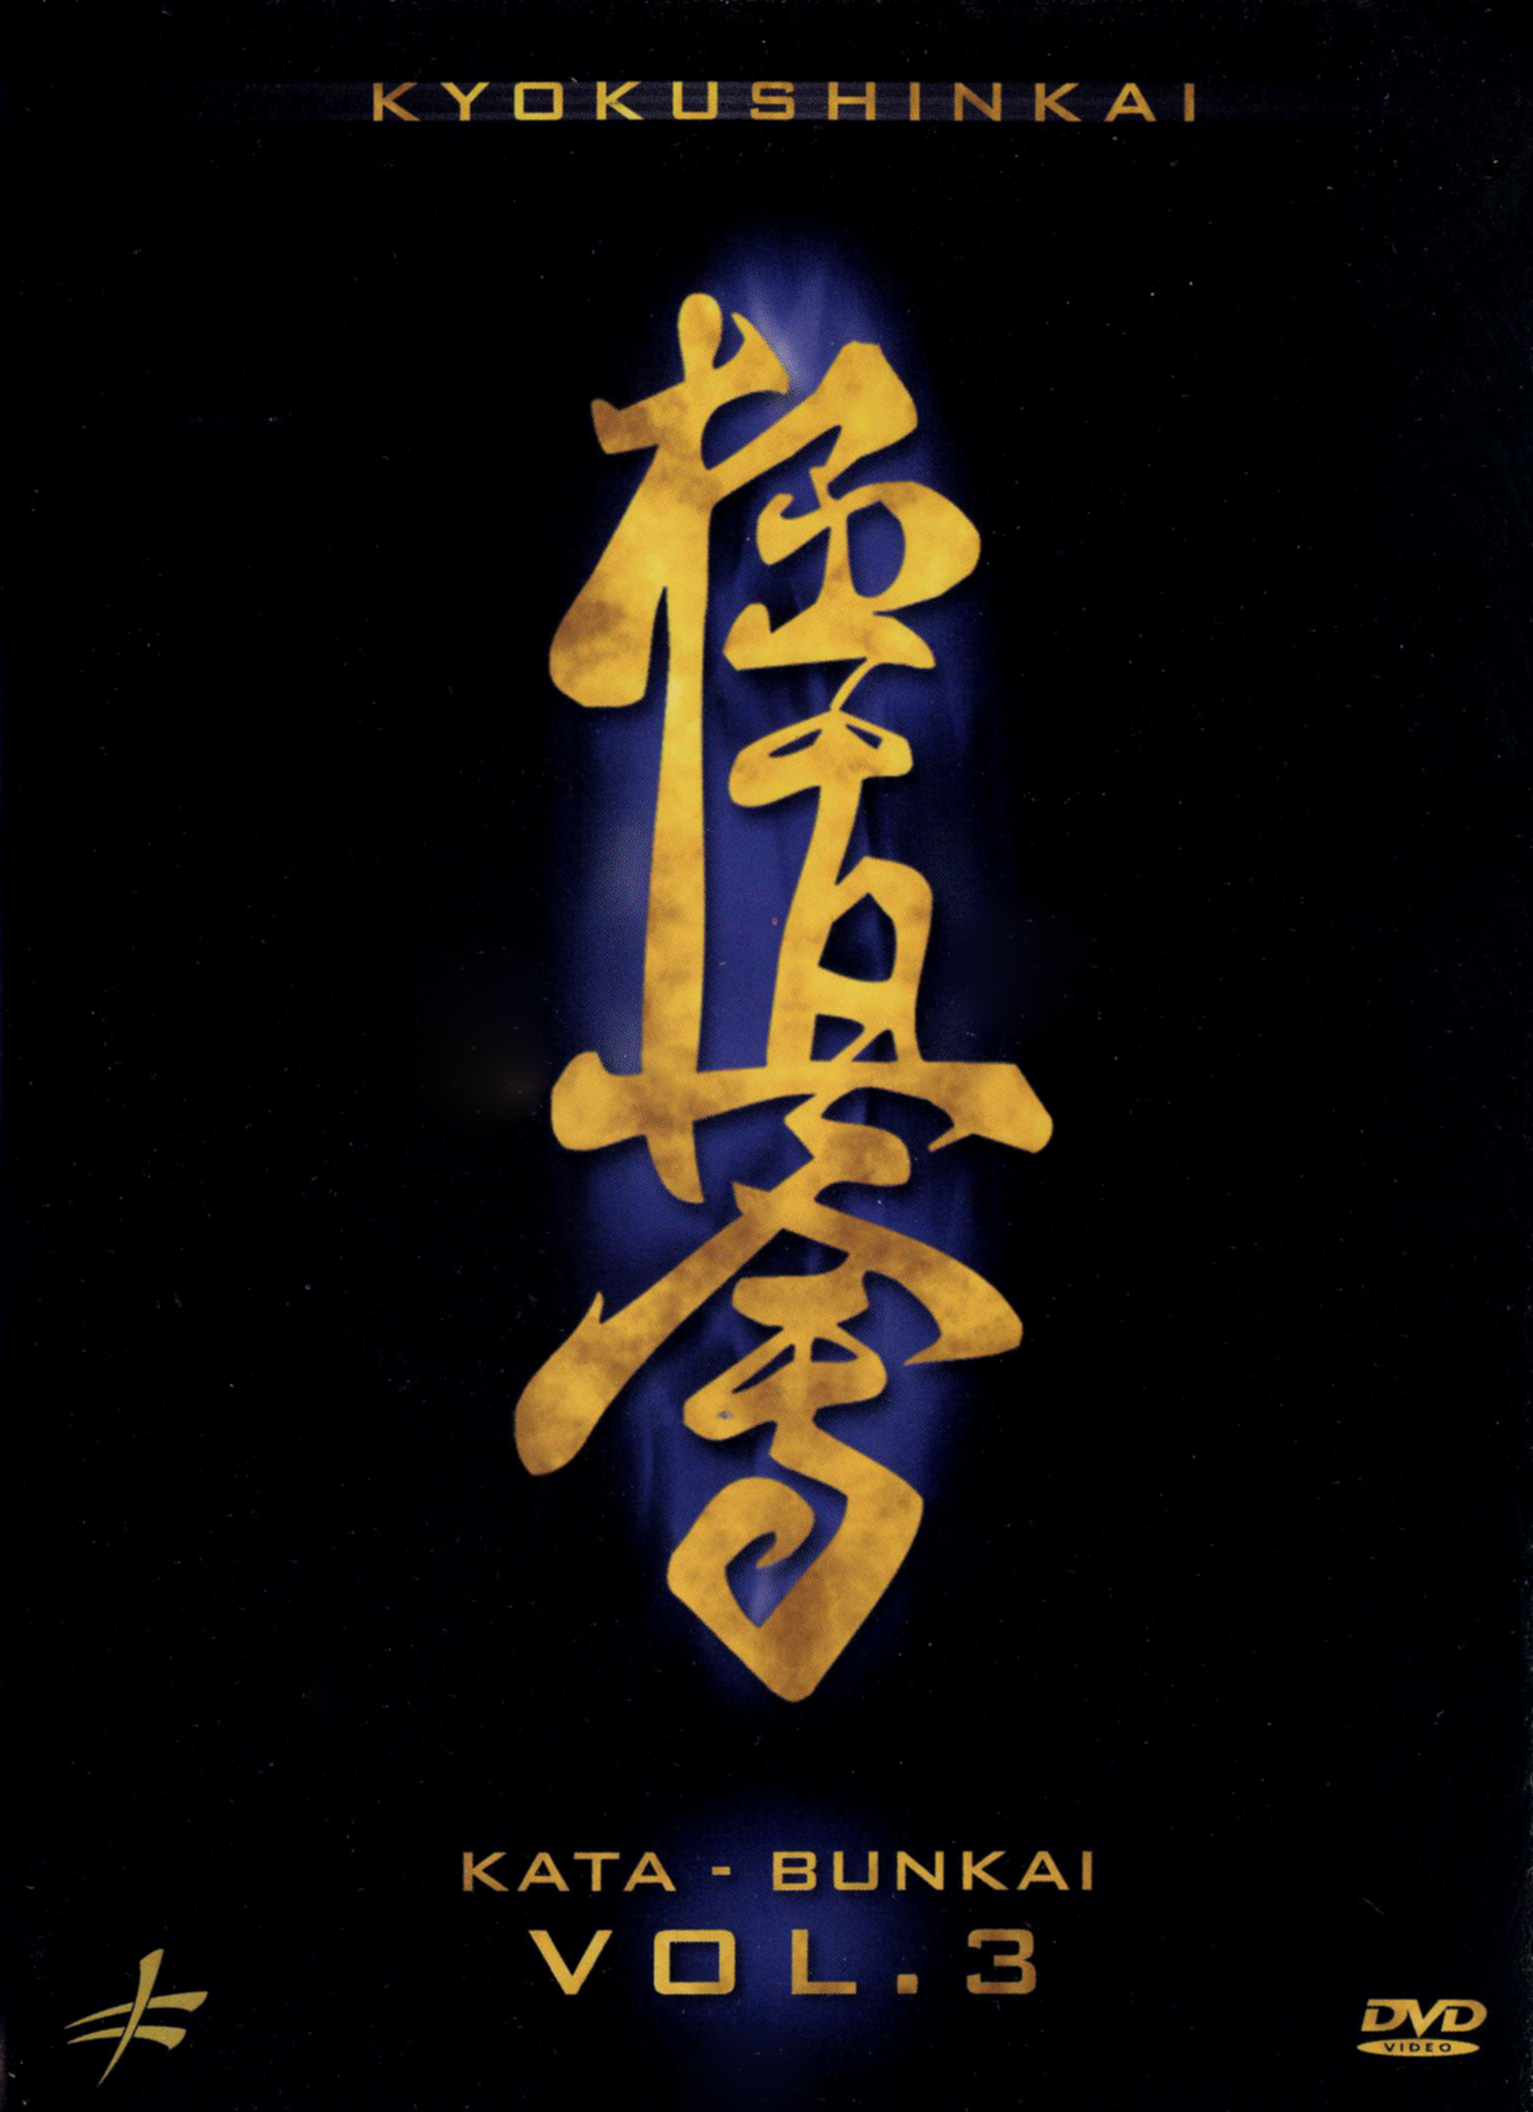 Kyokushinkai: Kata - Bunkai, Vol. 3